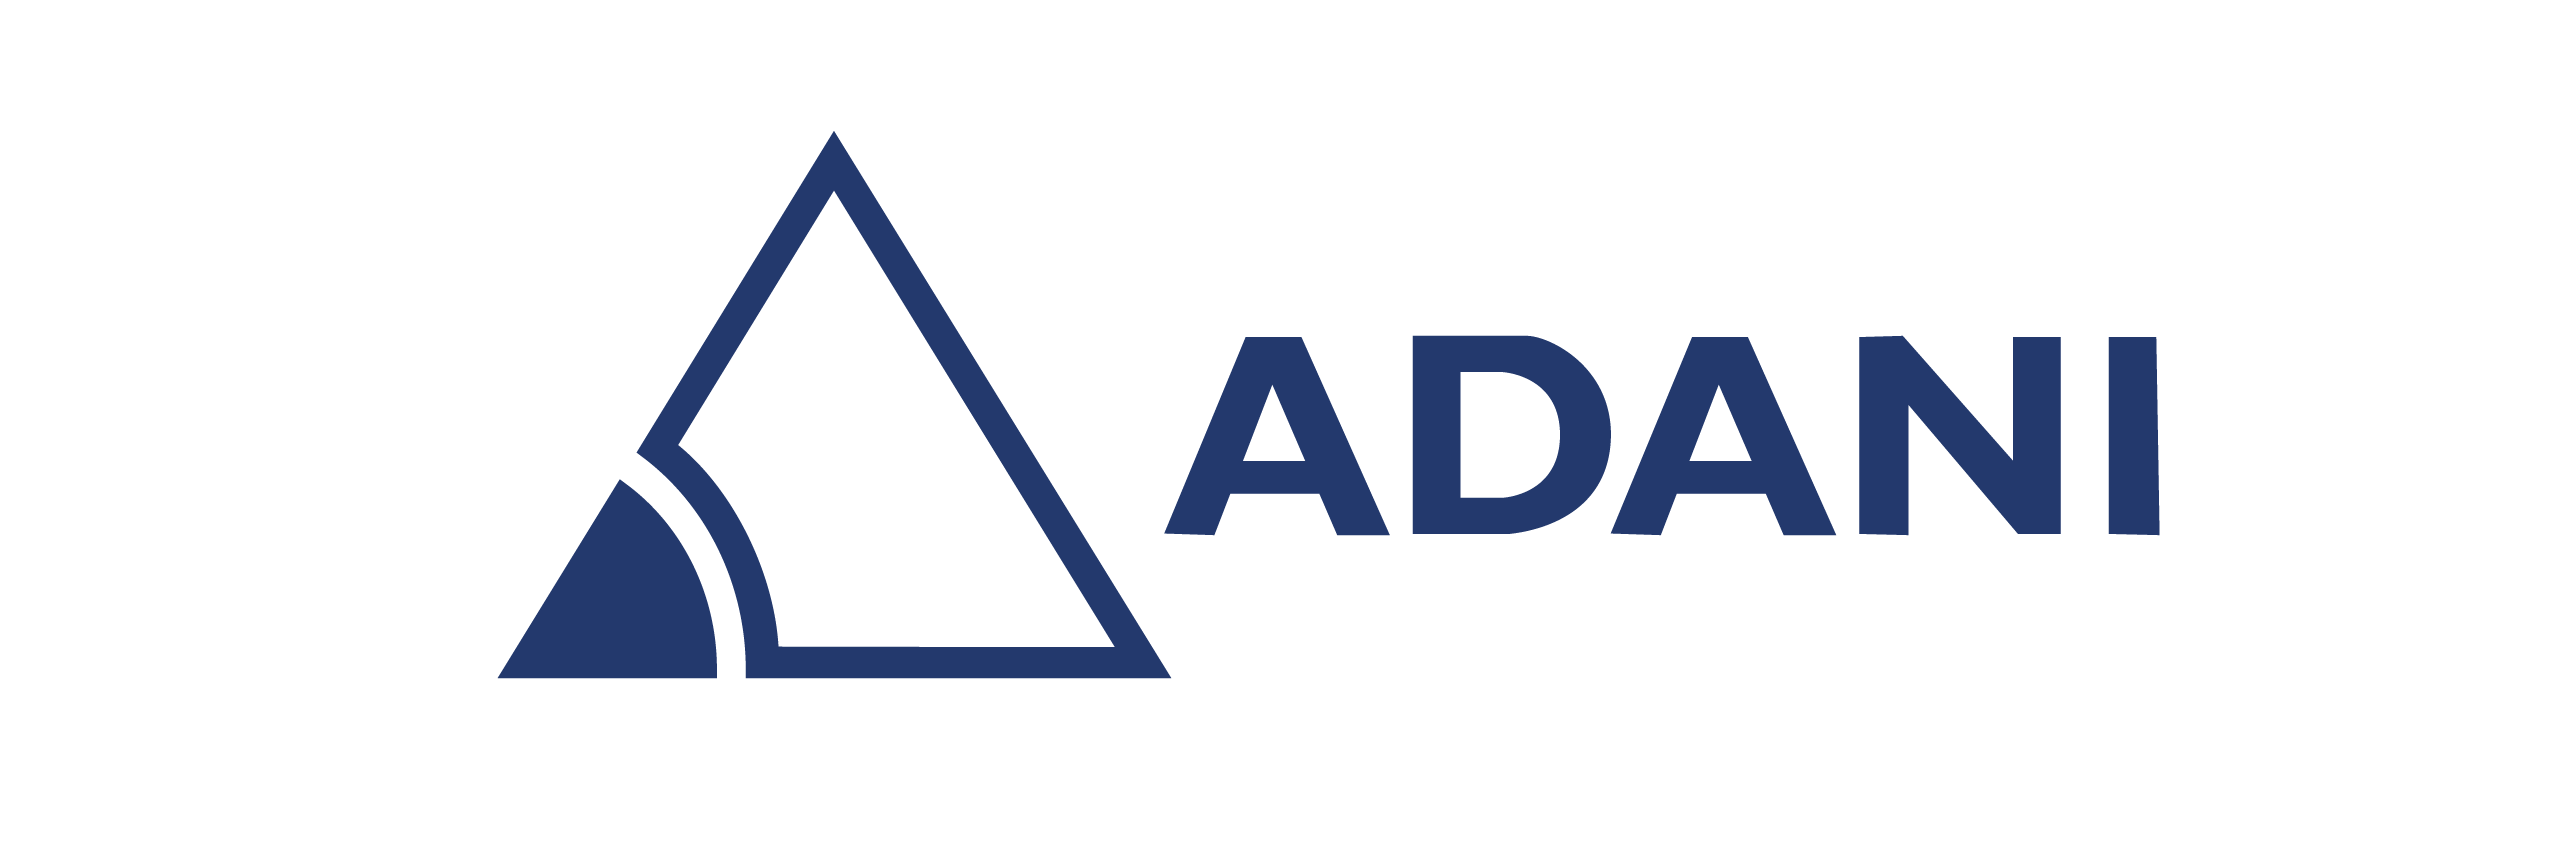 Adani I-optics